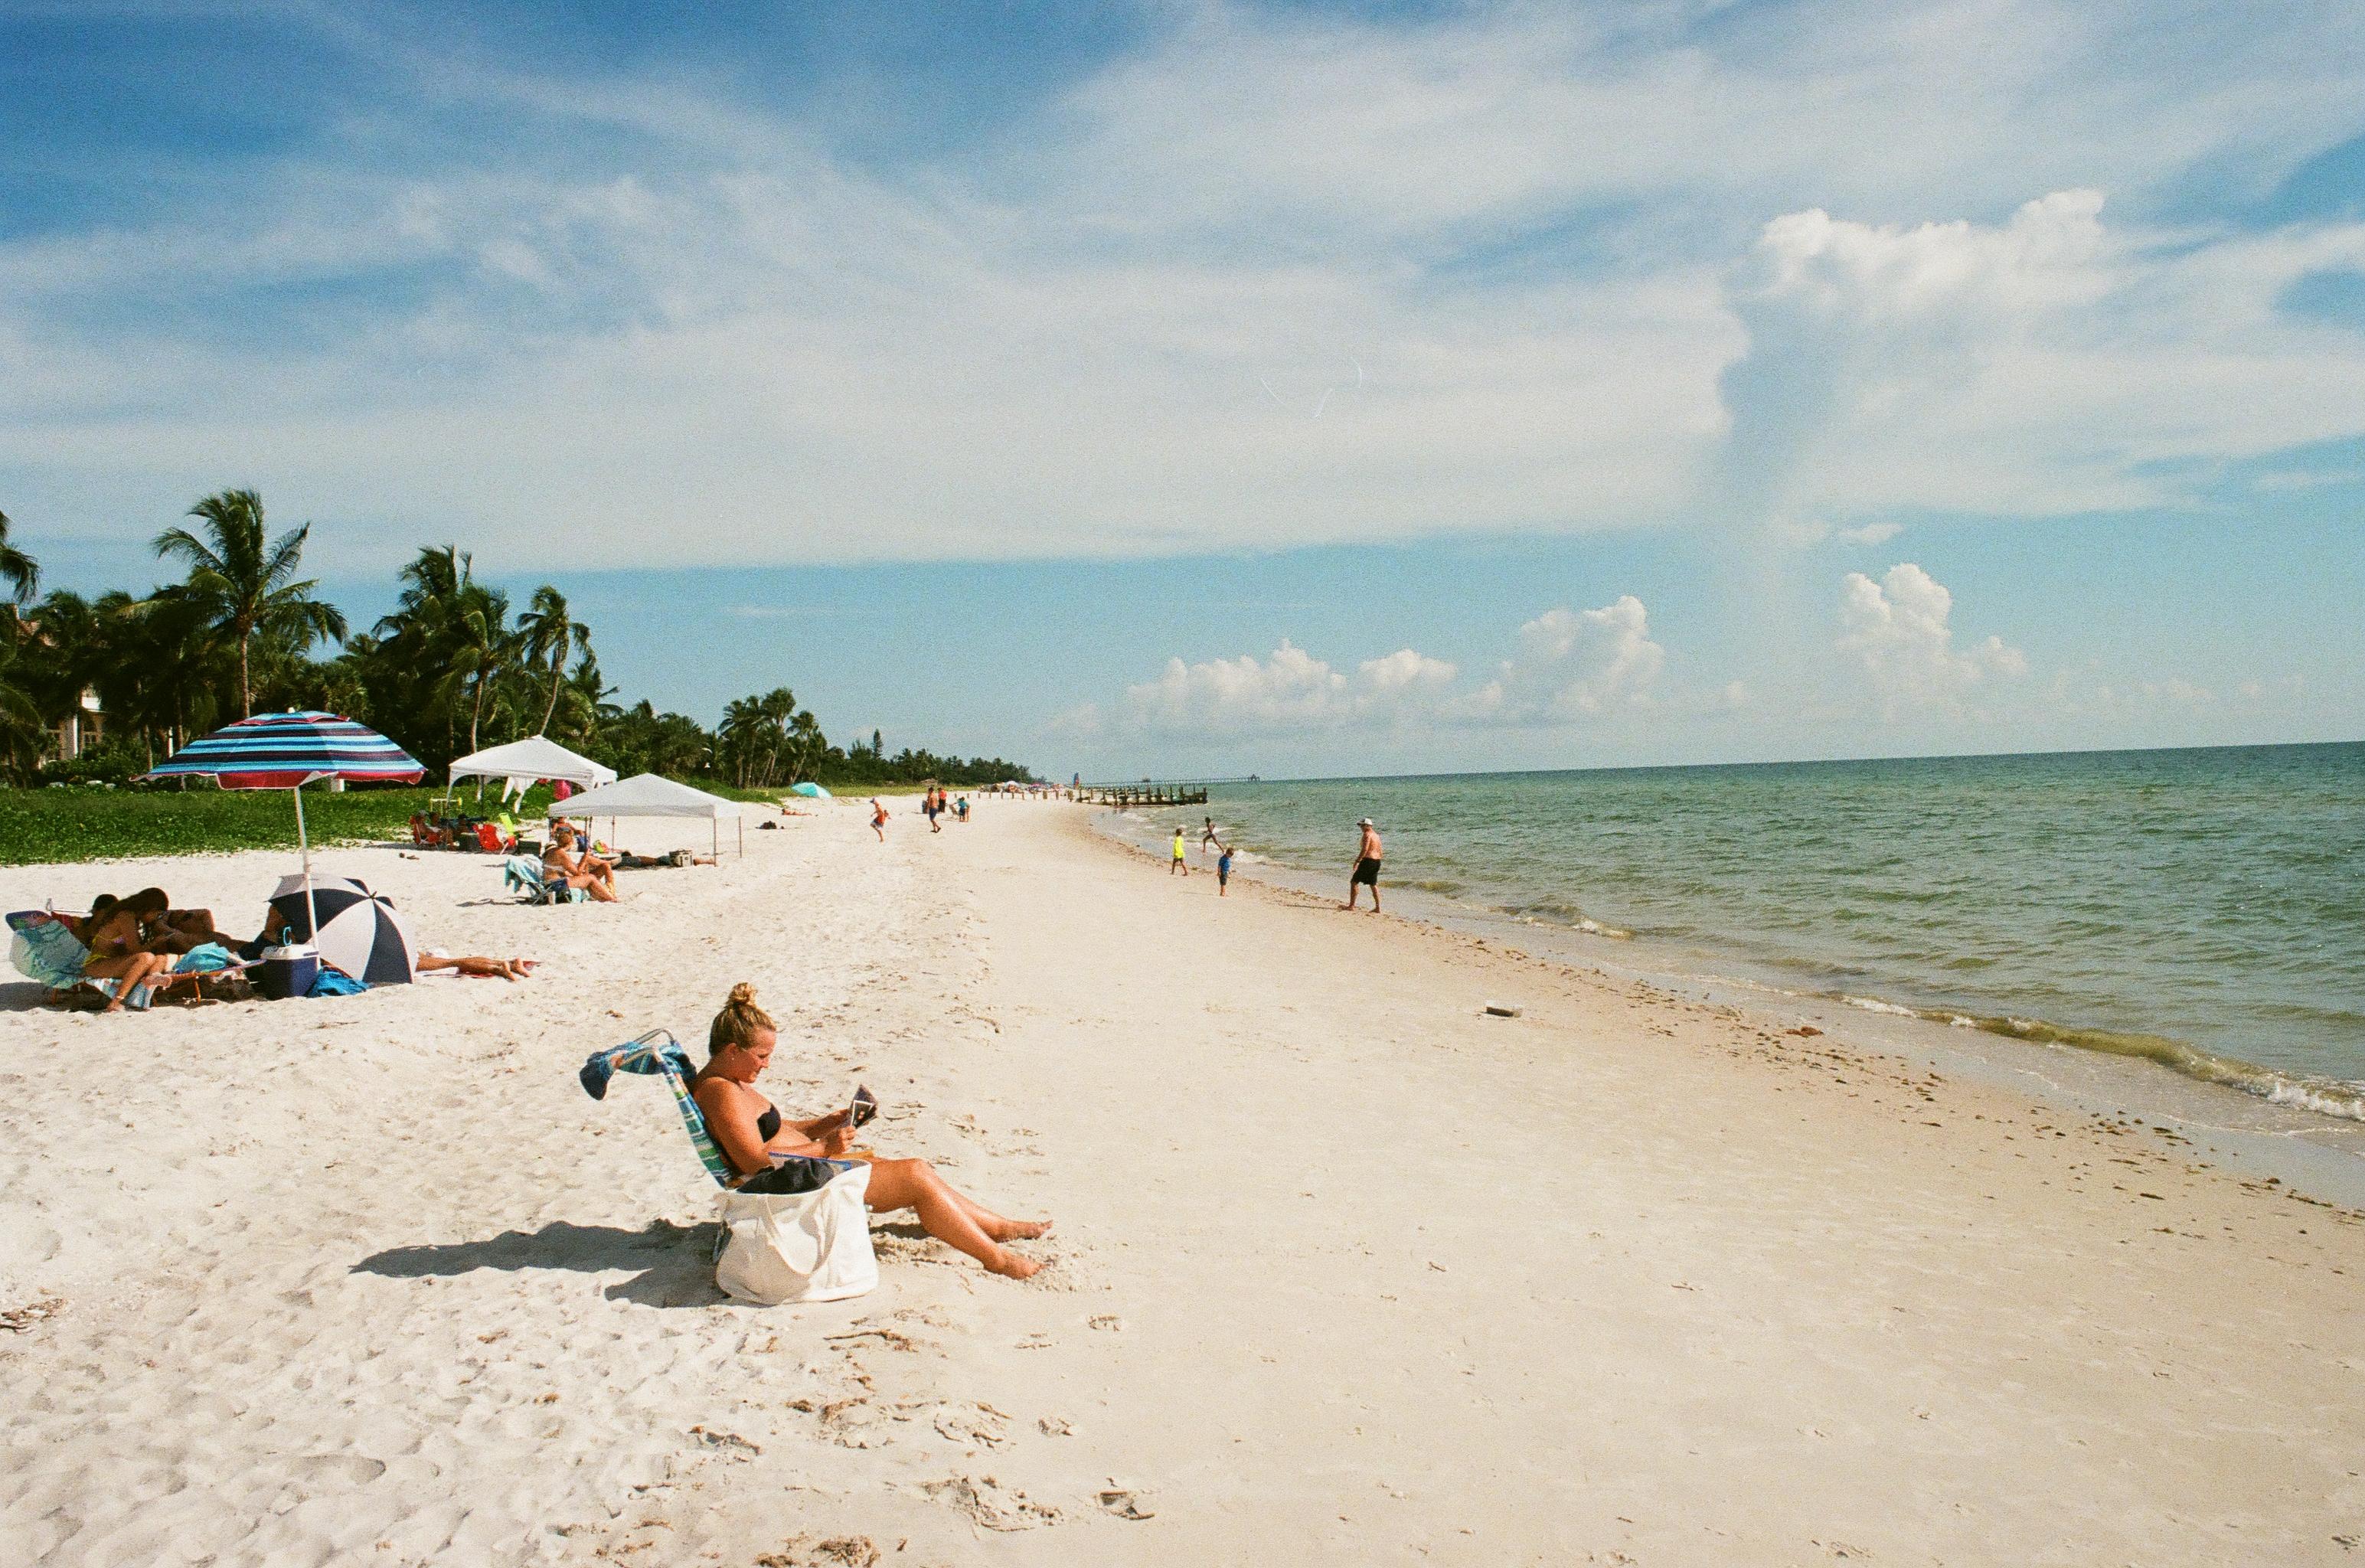 Naples Beach, FL. Kodak Ultramax 400 + Minolta XD-11 (a.k.a XD-7)